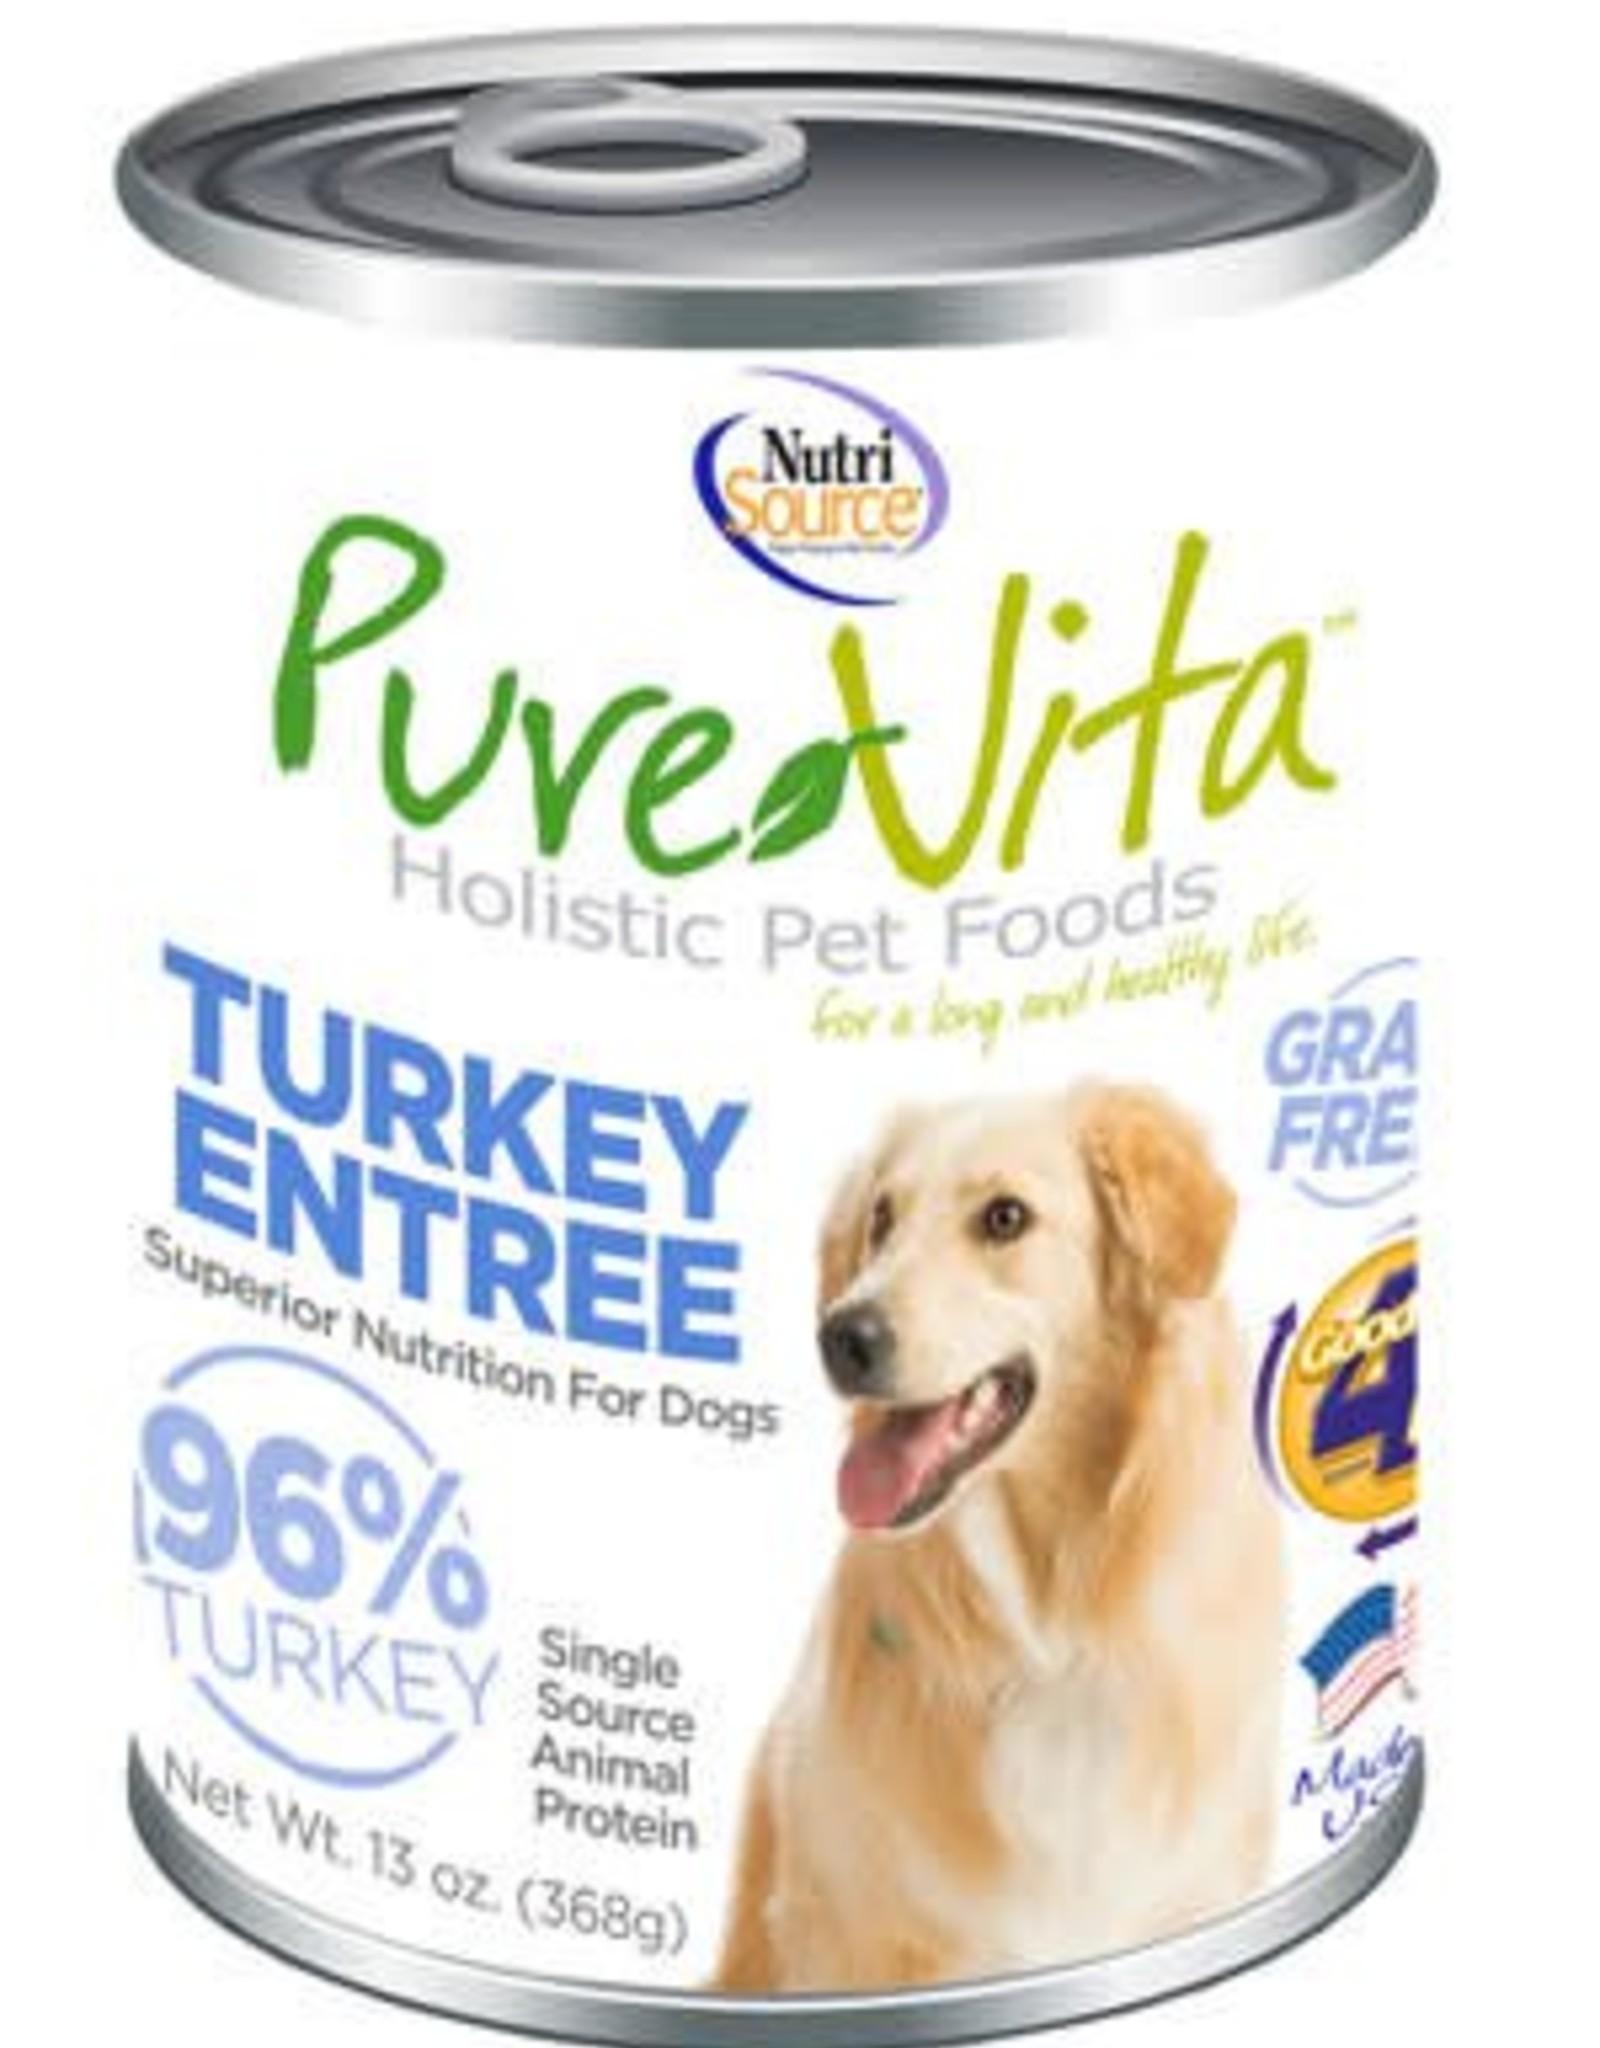 PureVita PureVita Turkey & Turkey Liver Dog Cans 13oz